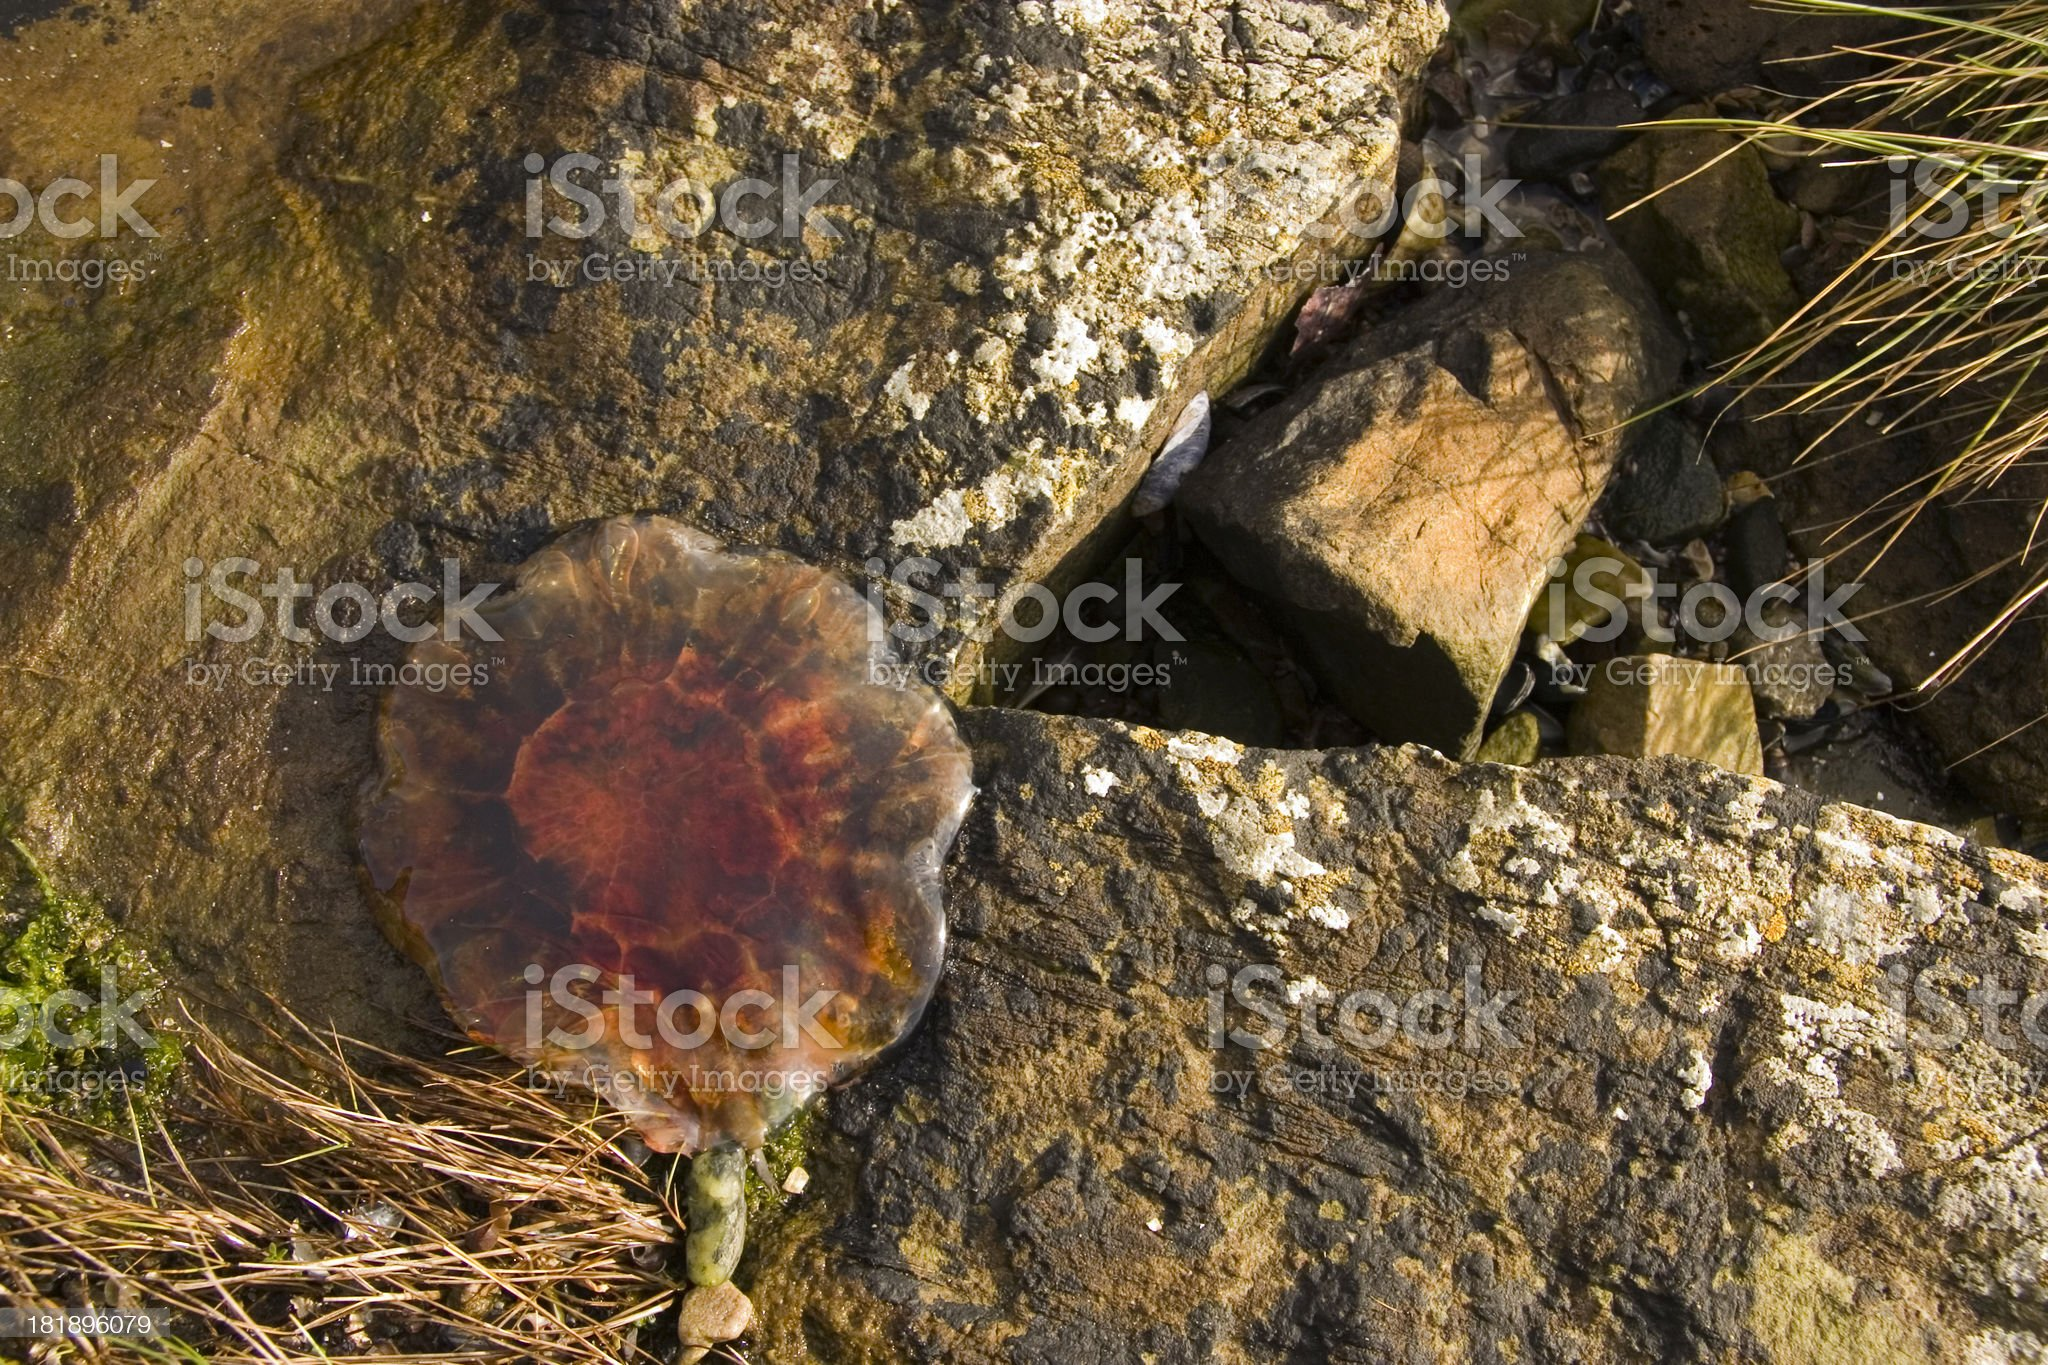 Jelly fish on the rocks royalty-free stock photo